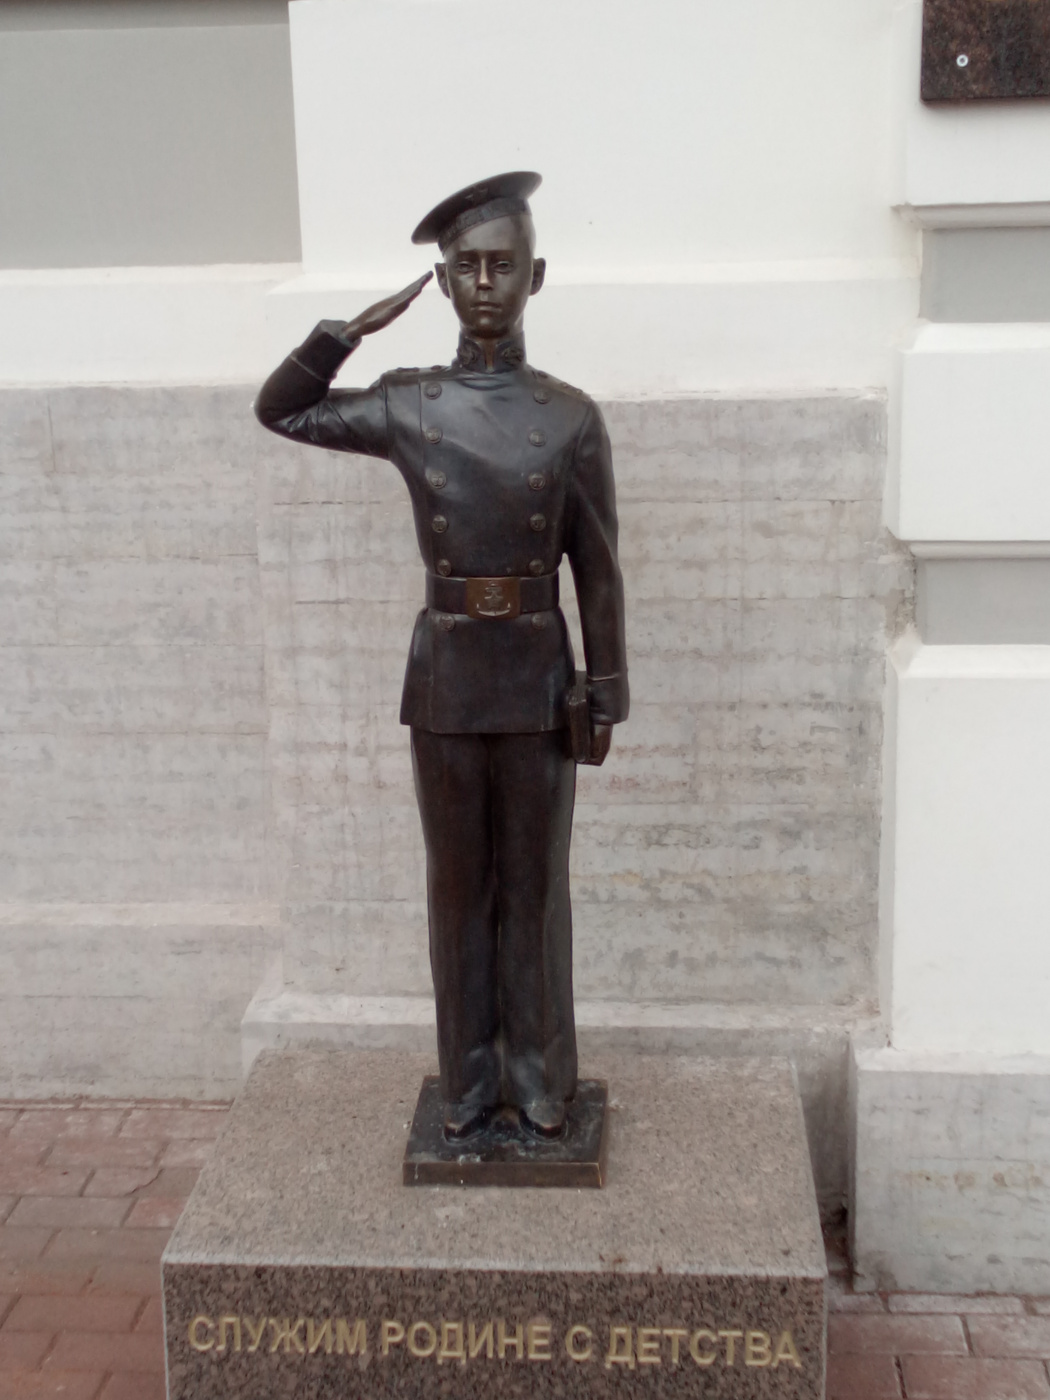 Алексей Гришанков (Alegri). Brave Cadet